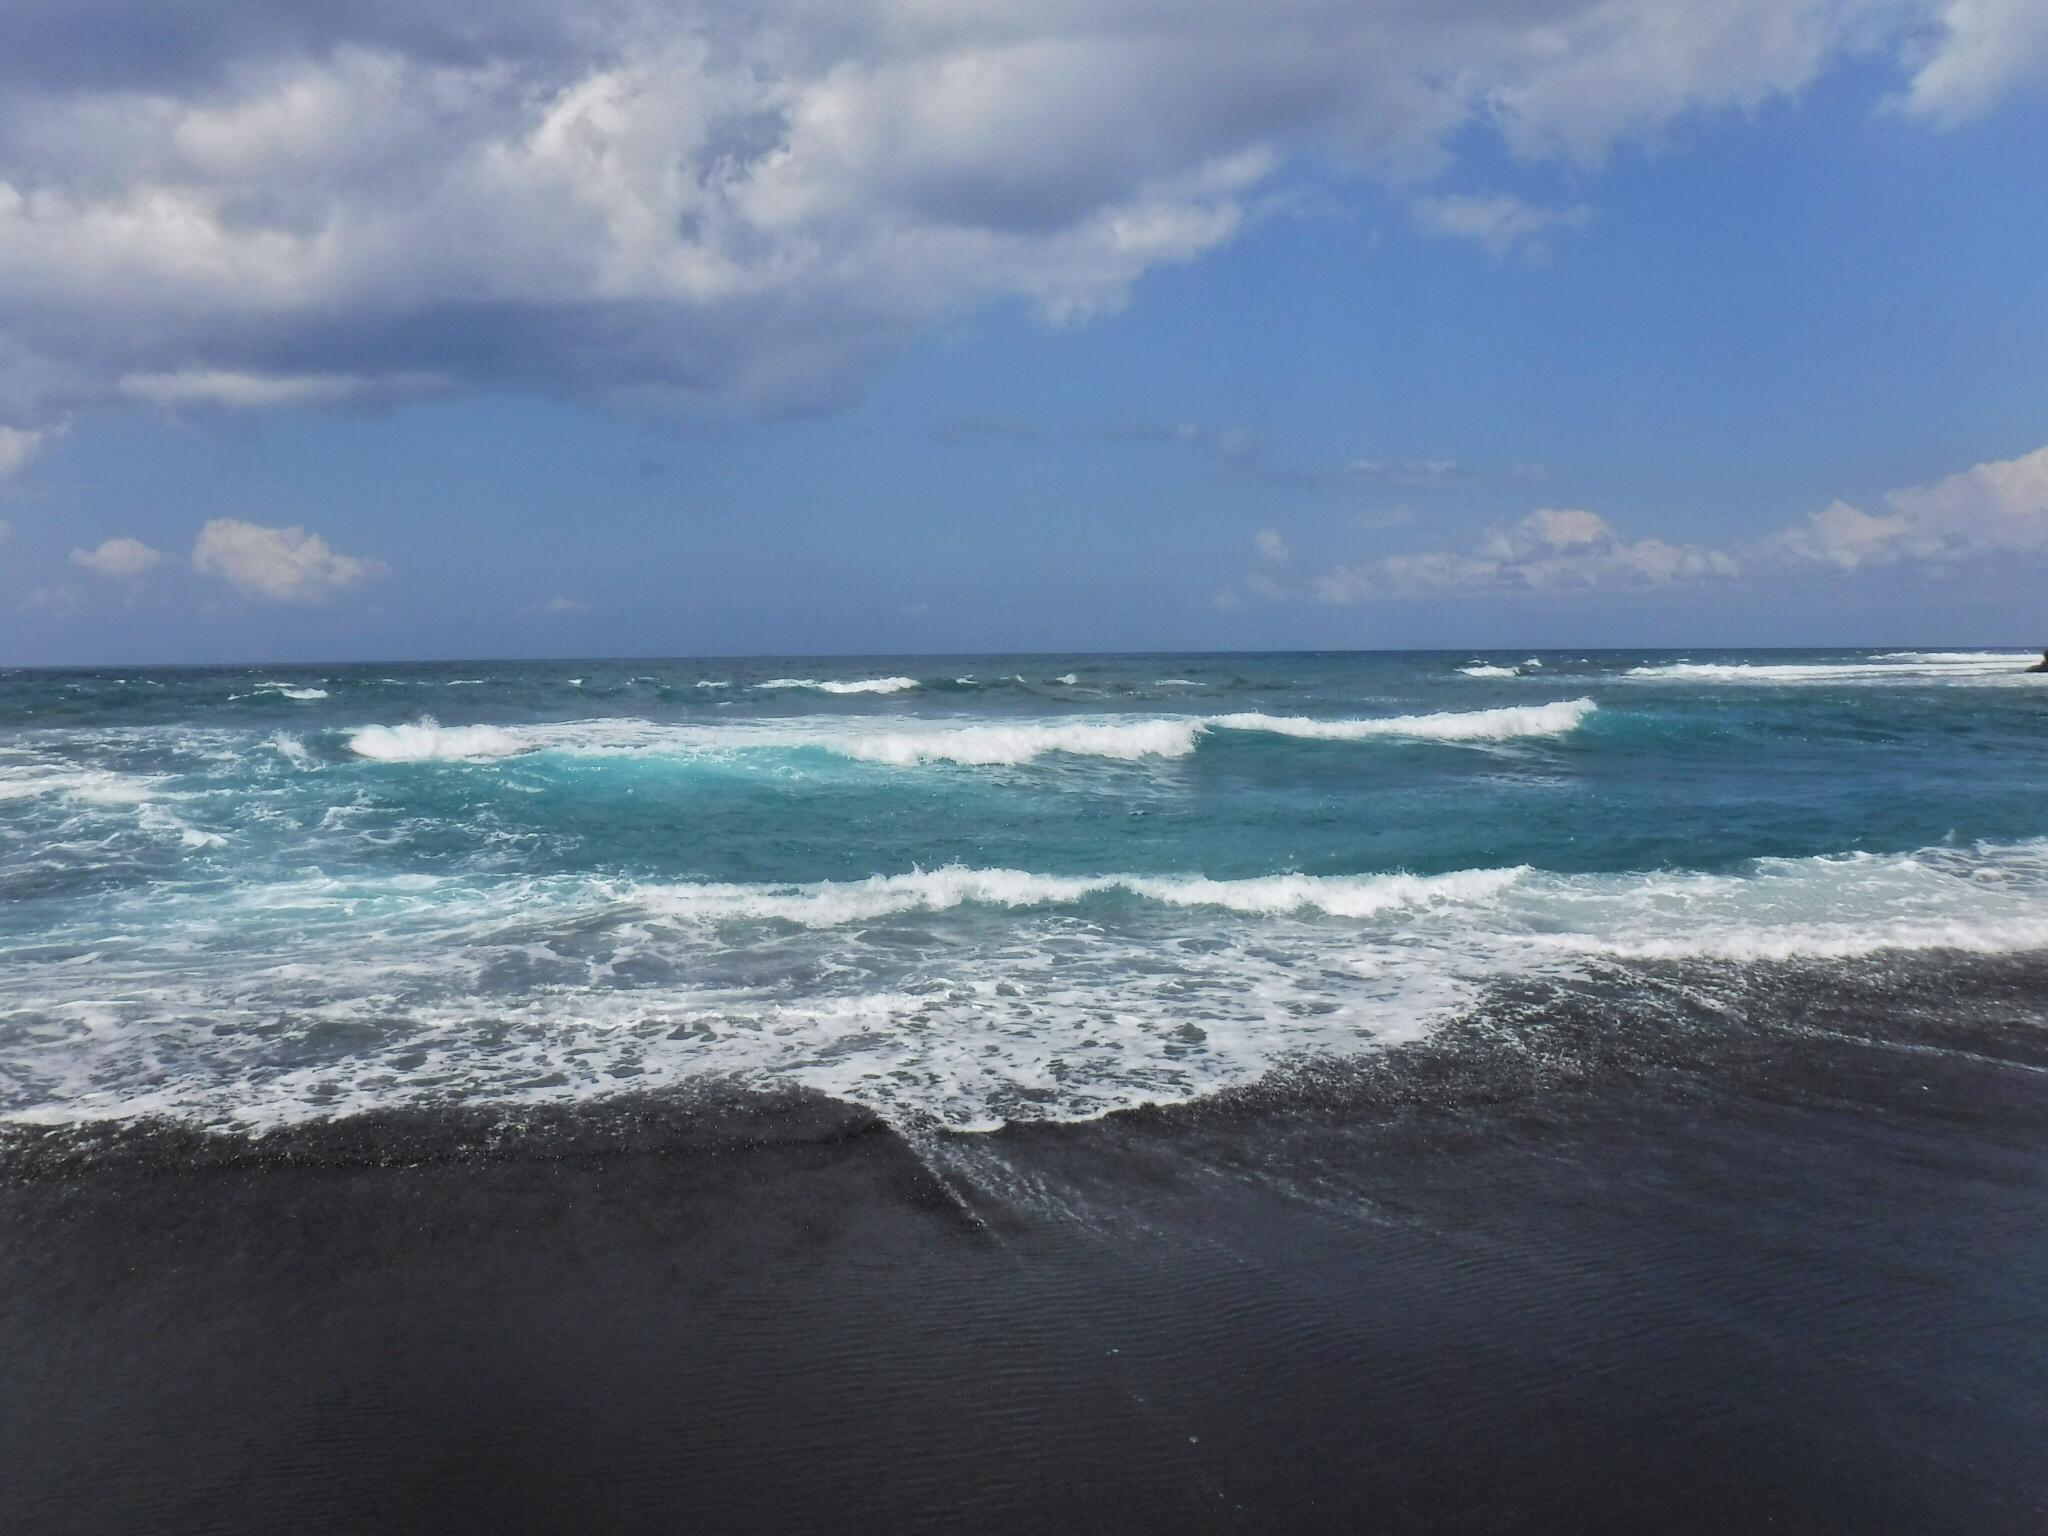 Bali, Indonesia on Cucukan's black sand beach